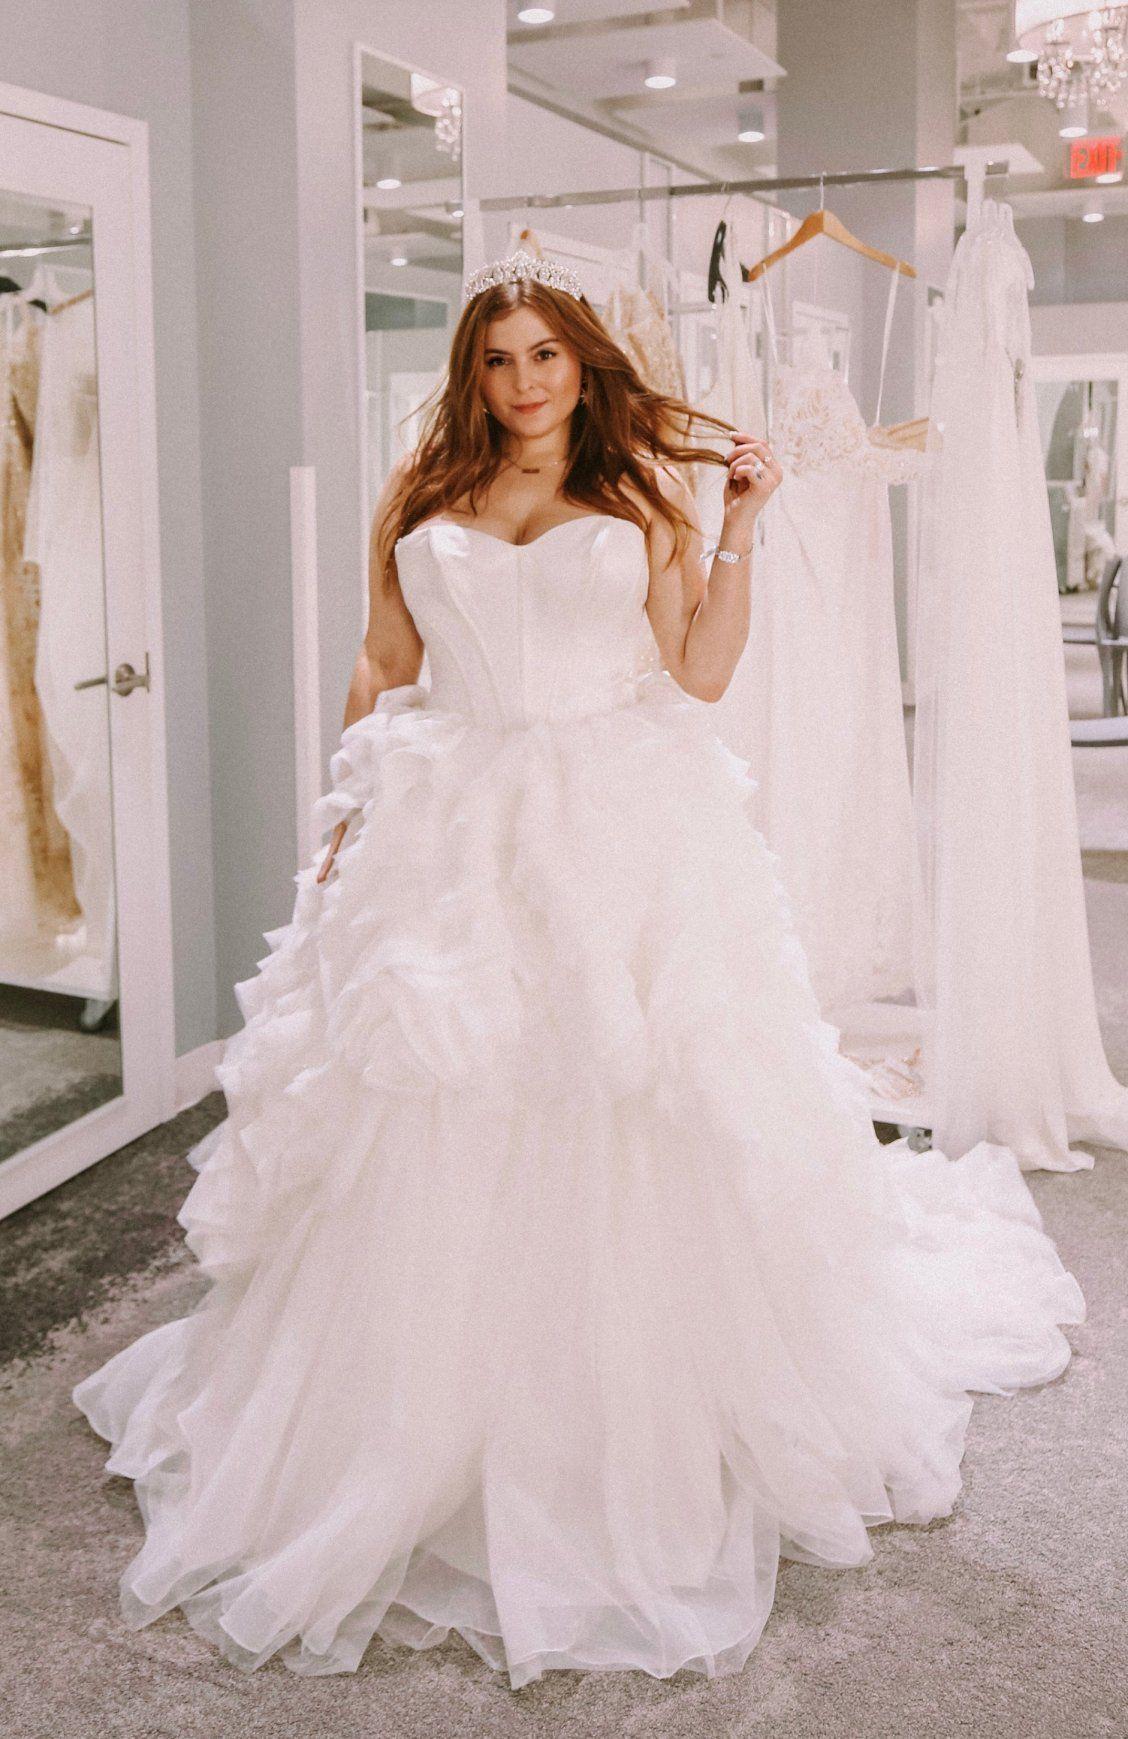 Noelle Shares Some Of Her Favorite Wedding Dresses At David S Bridal Noelle S Favorite Glitter Bridesmaid Dresses Wedding Dress Inspiration Wedding Dresses [ 1739 x 1128 Pixel ]